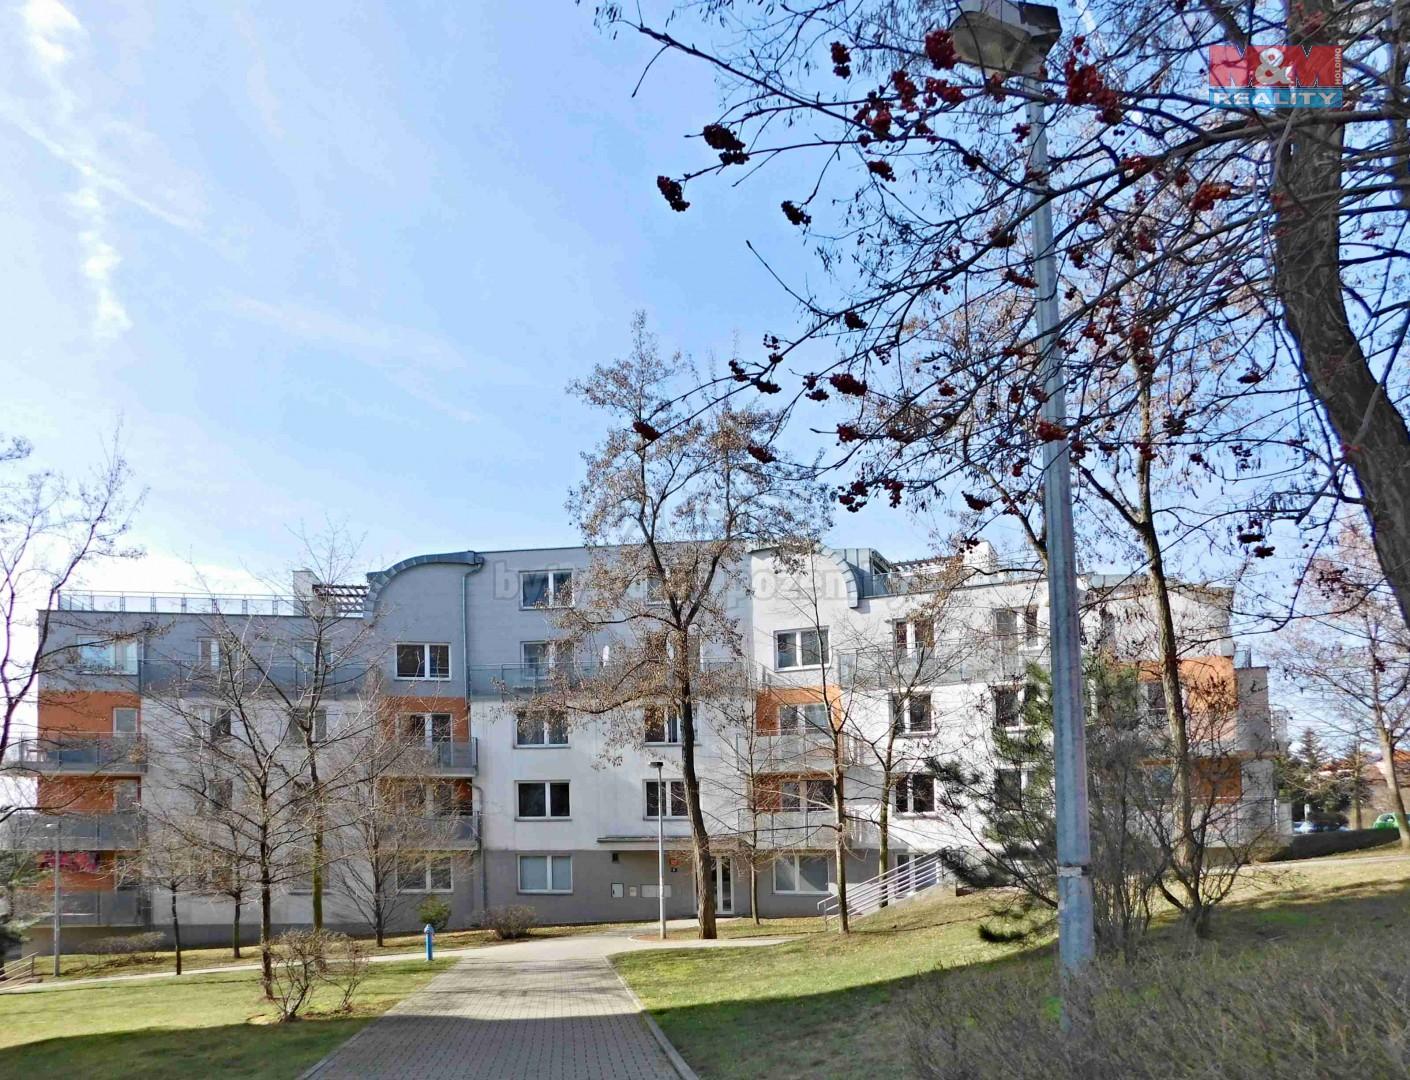 Prodej, byt 2+kk, 43 m2, OV, Praha 10 - Záběhlice